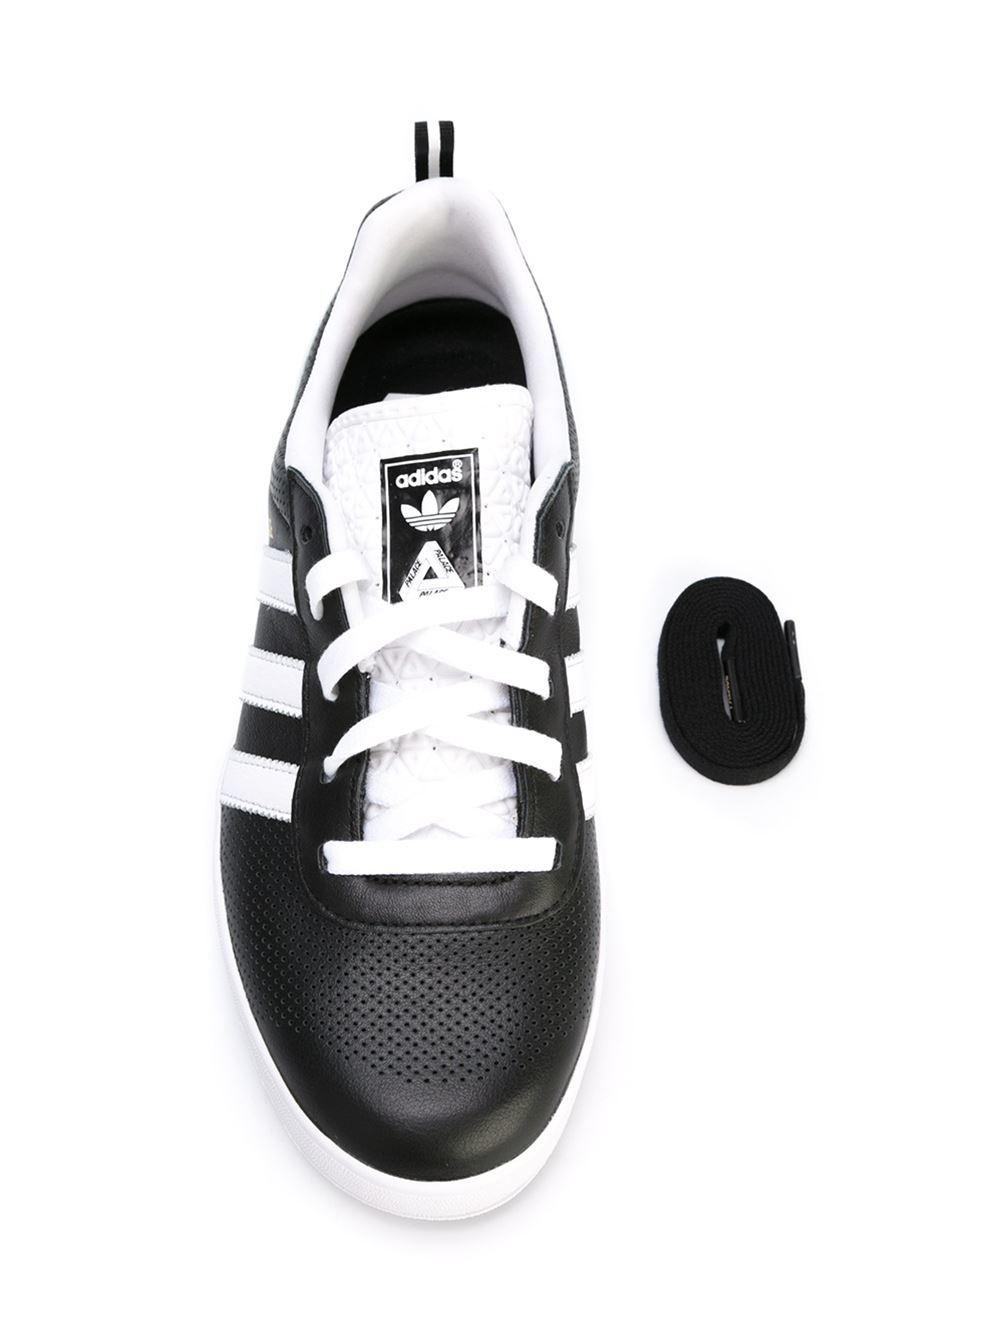 adidas Originals Mens X Palace Pro Suede Trainers BlackWhiteGold